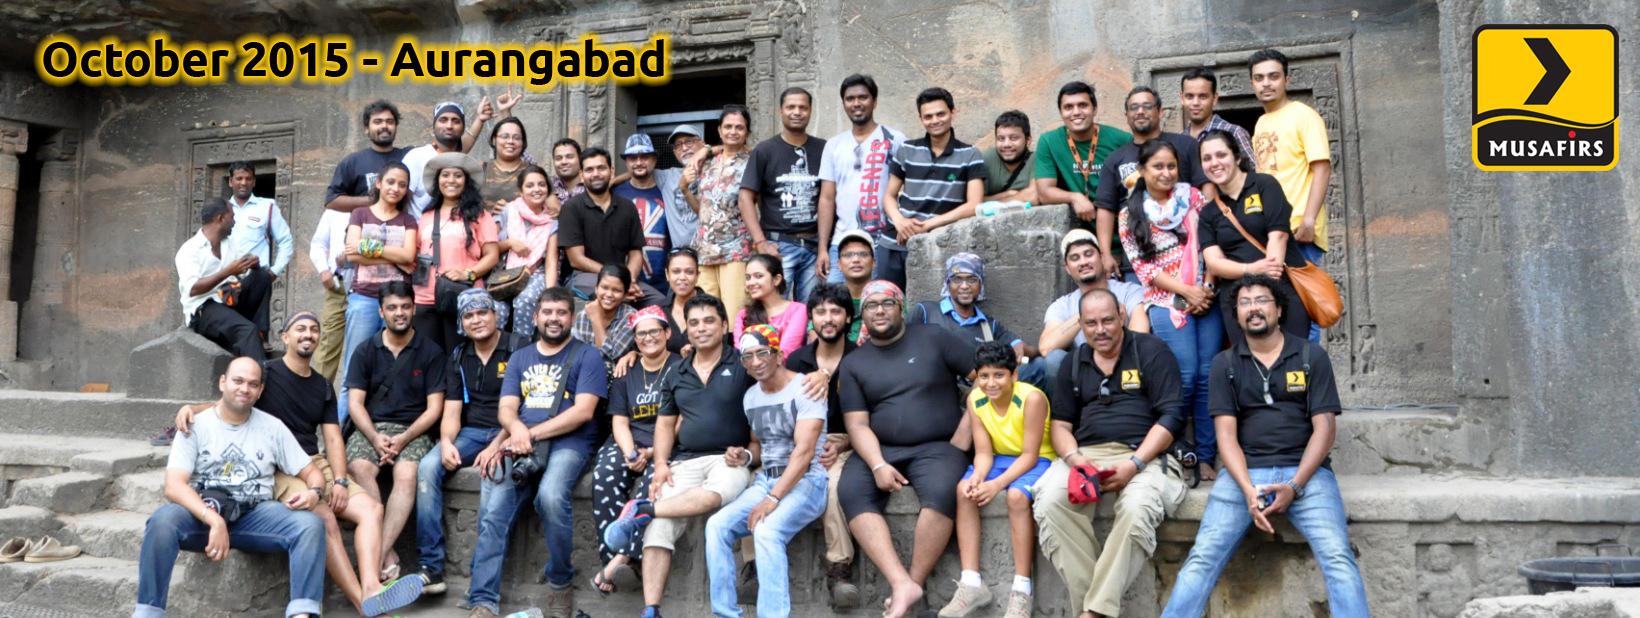 October 2015 Aurangabad